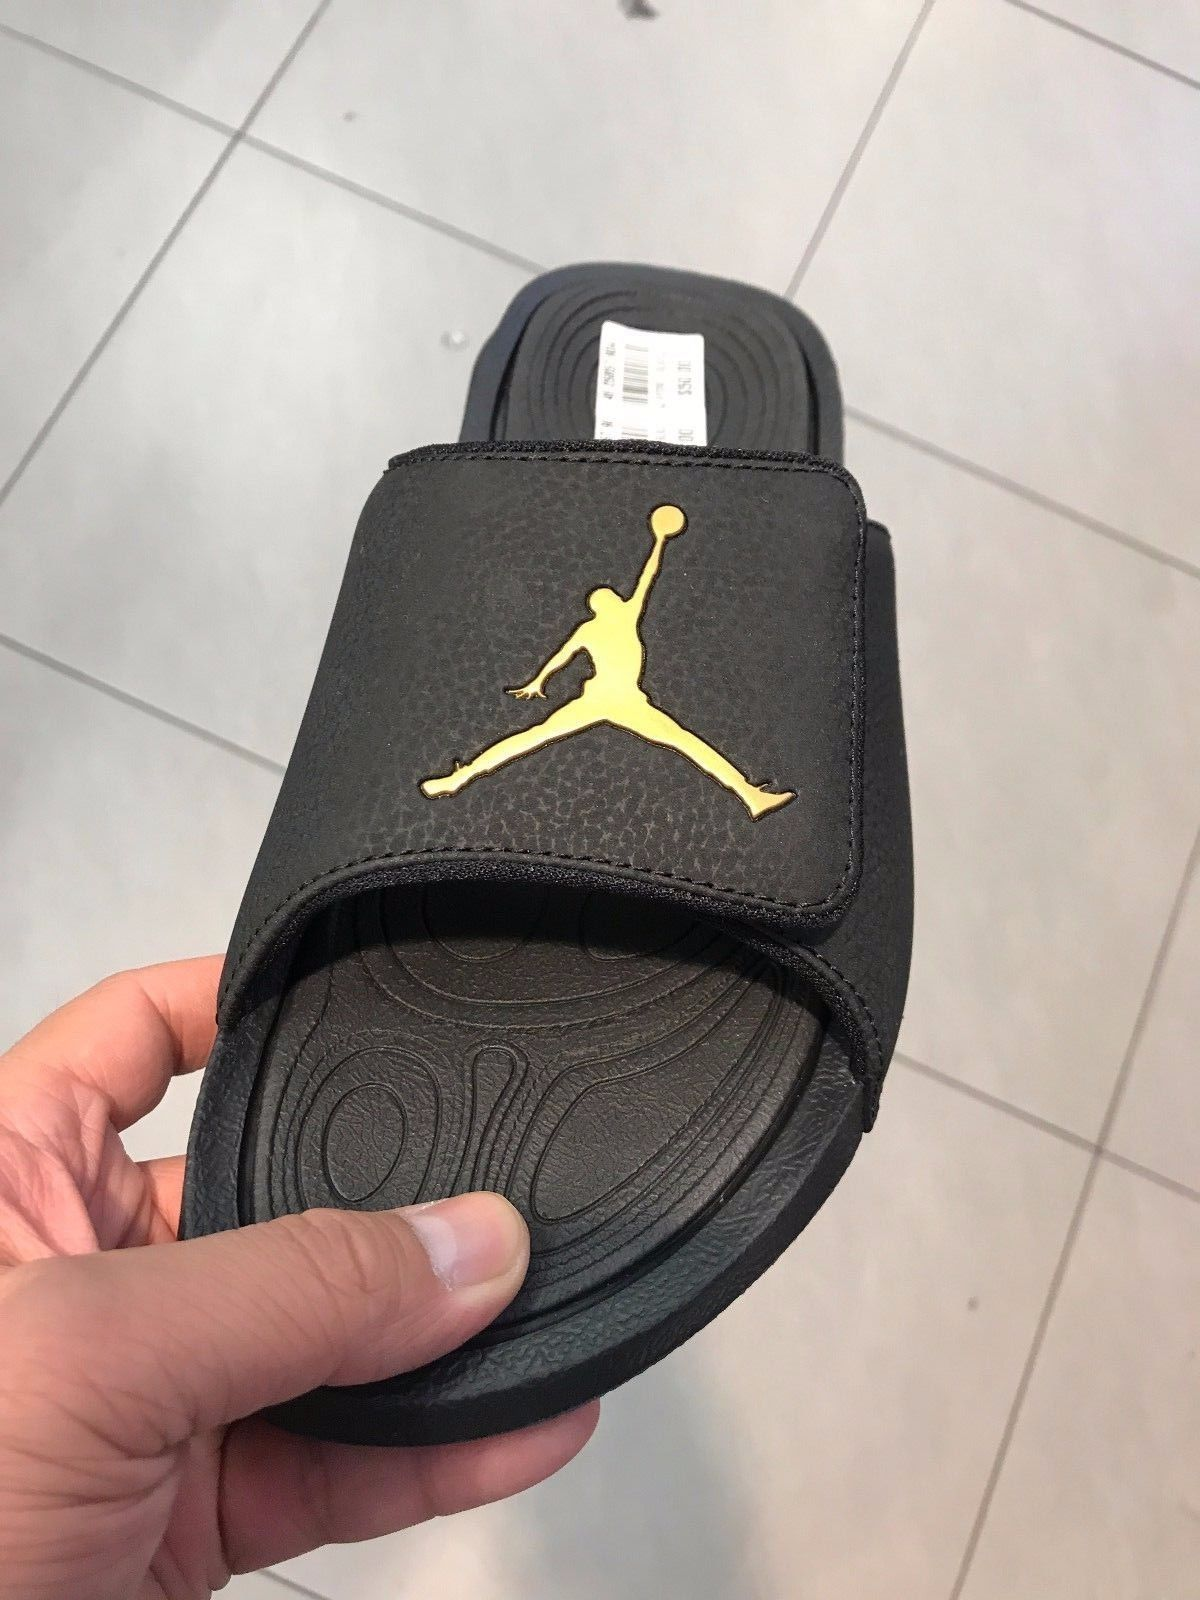 hot sale online 5f3e6 3b04f Details about Nike Jordan Hydro 7 V2 Black Gold Men Sports ...